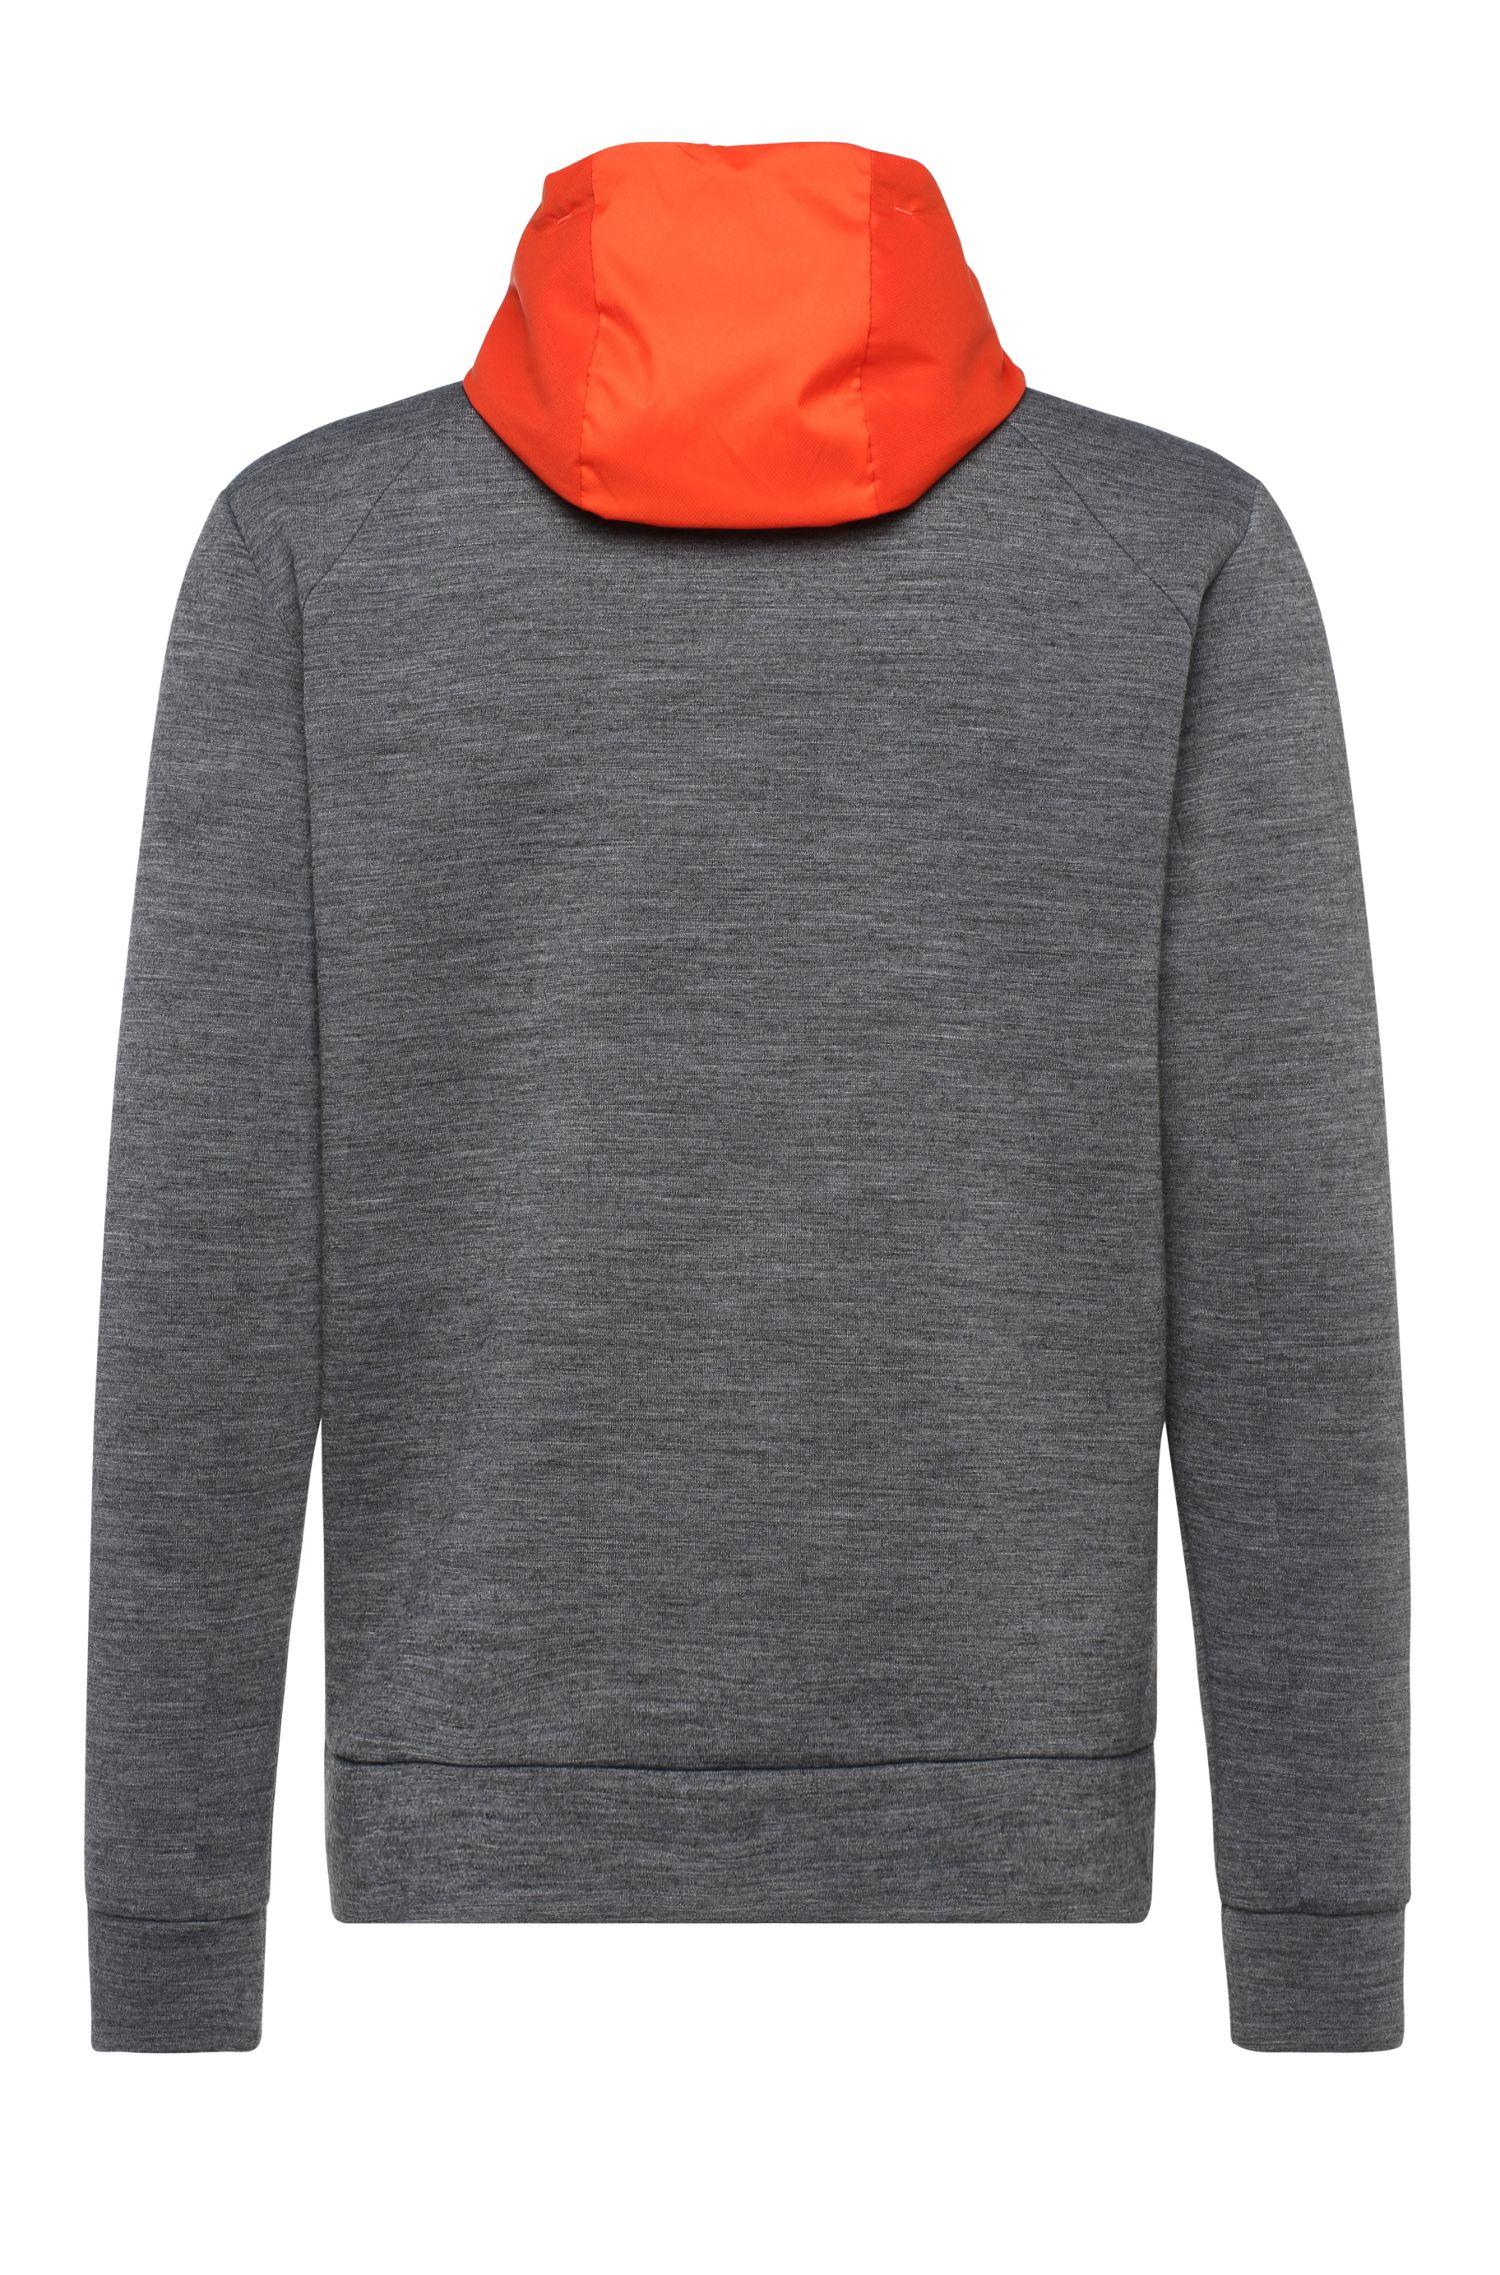 Melierte Sweatshirt-Jacke aus Jersey mit Kapuze: ´Sawotech`